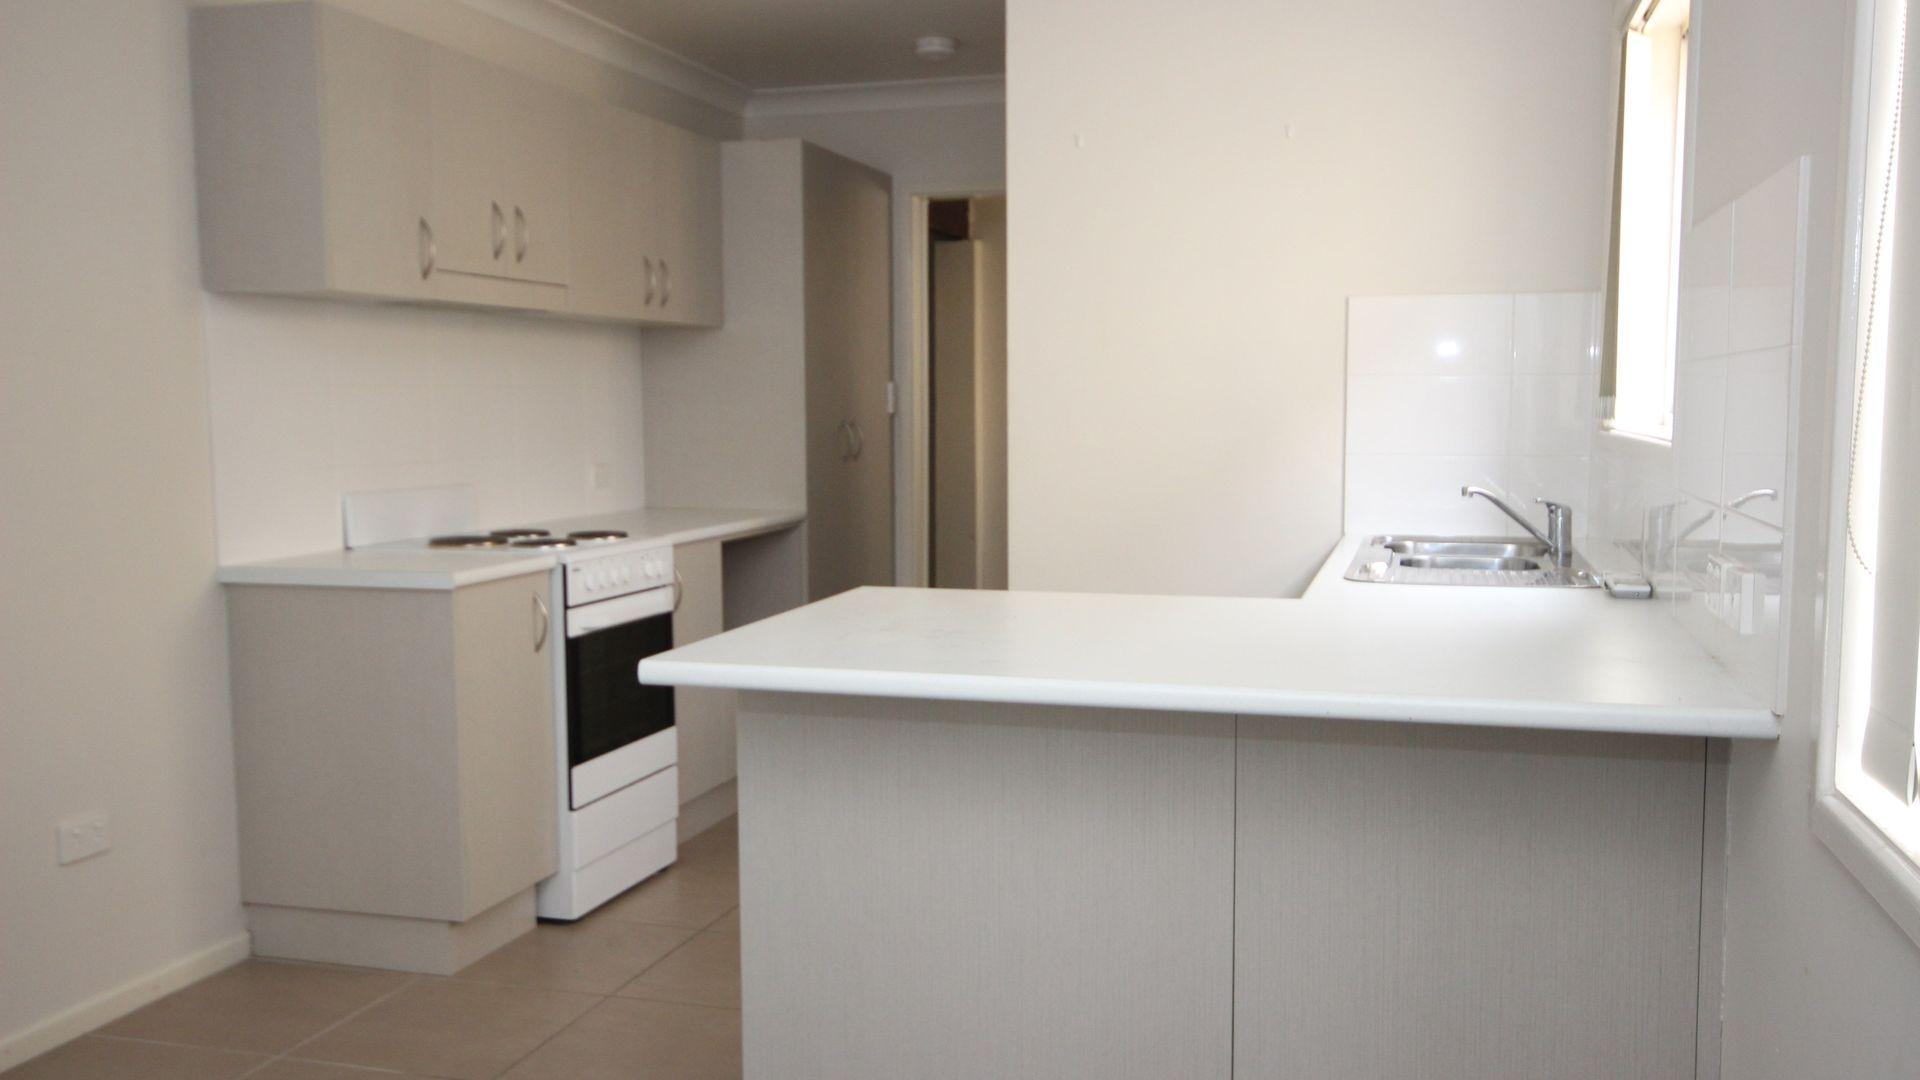 4/142 Kennedy Drive, Tweed Heads West NSW 2485, Image 2